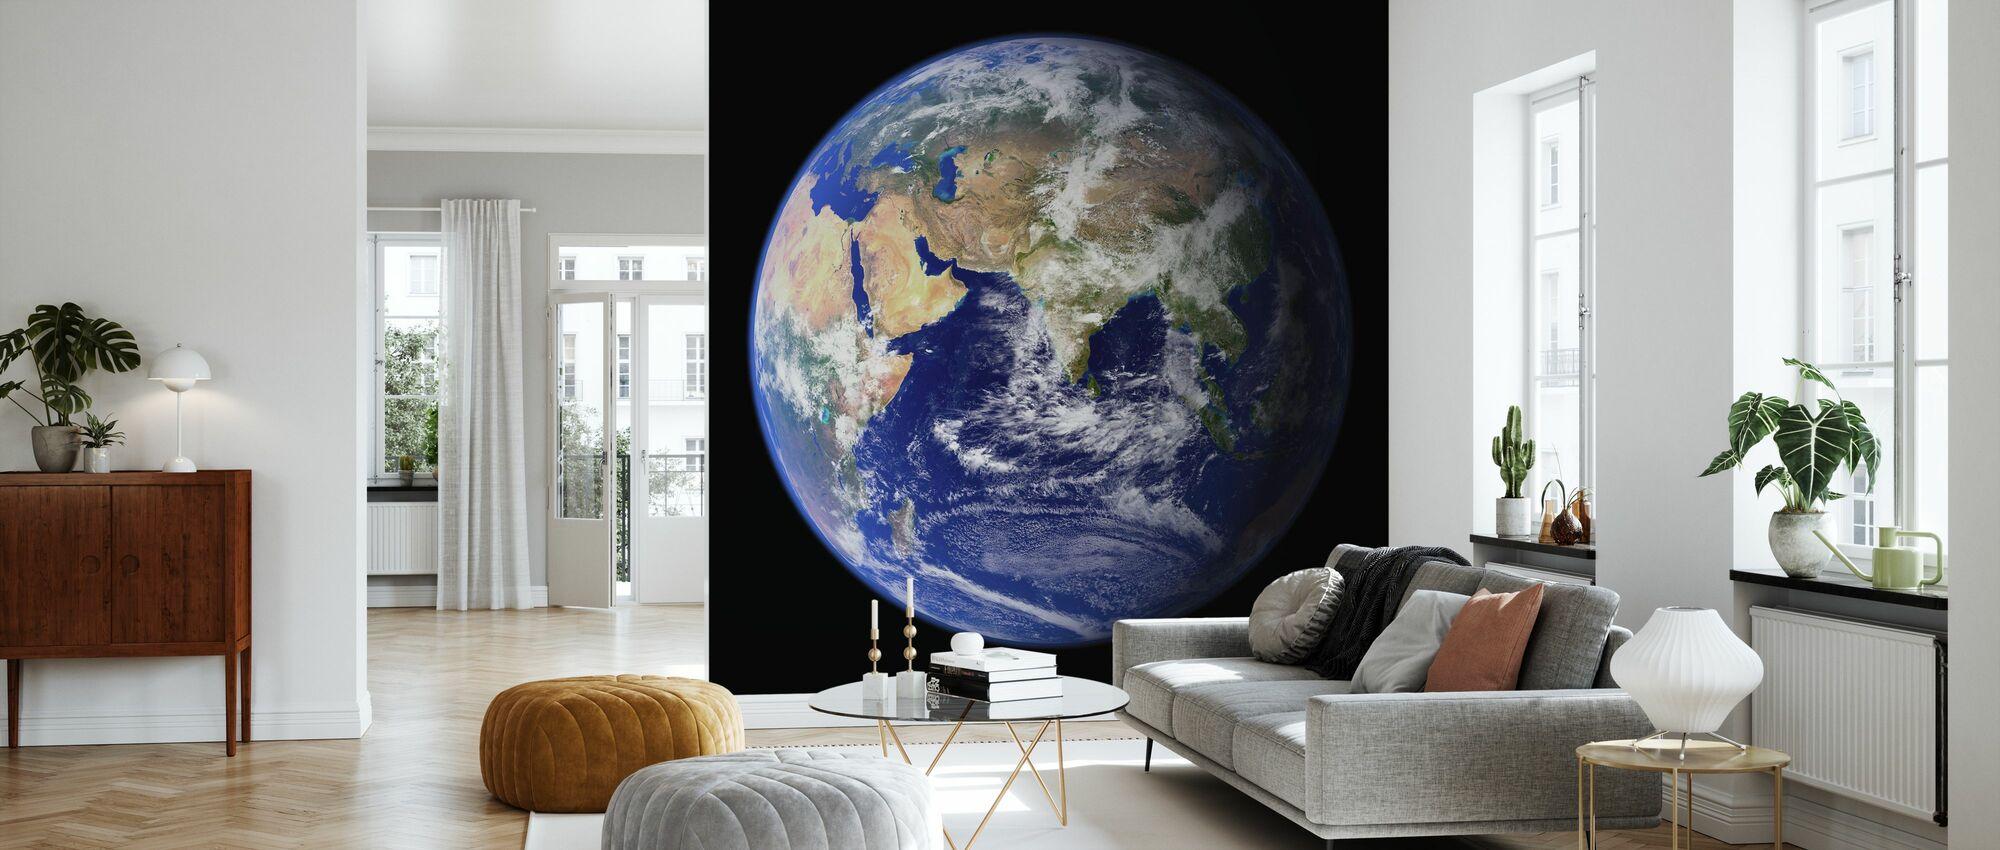 Earth - Wallpaper - Living Room